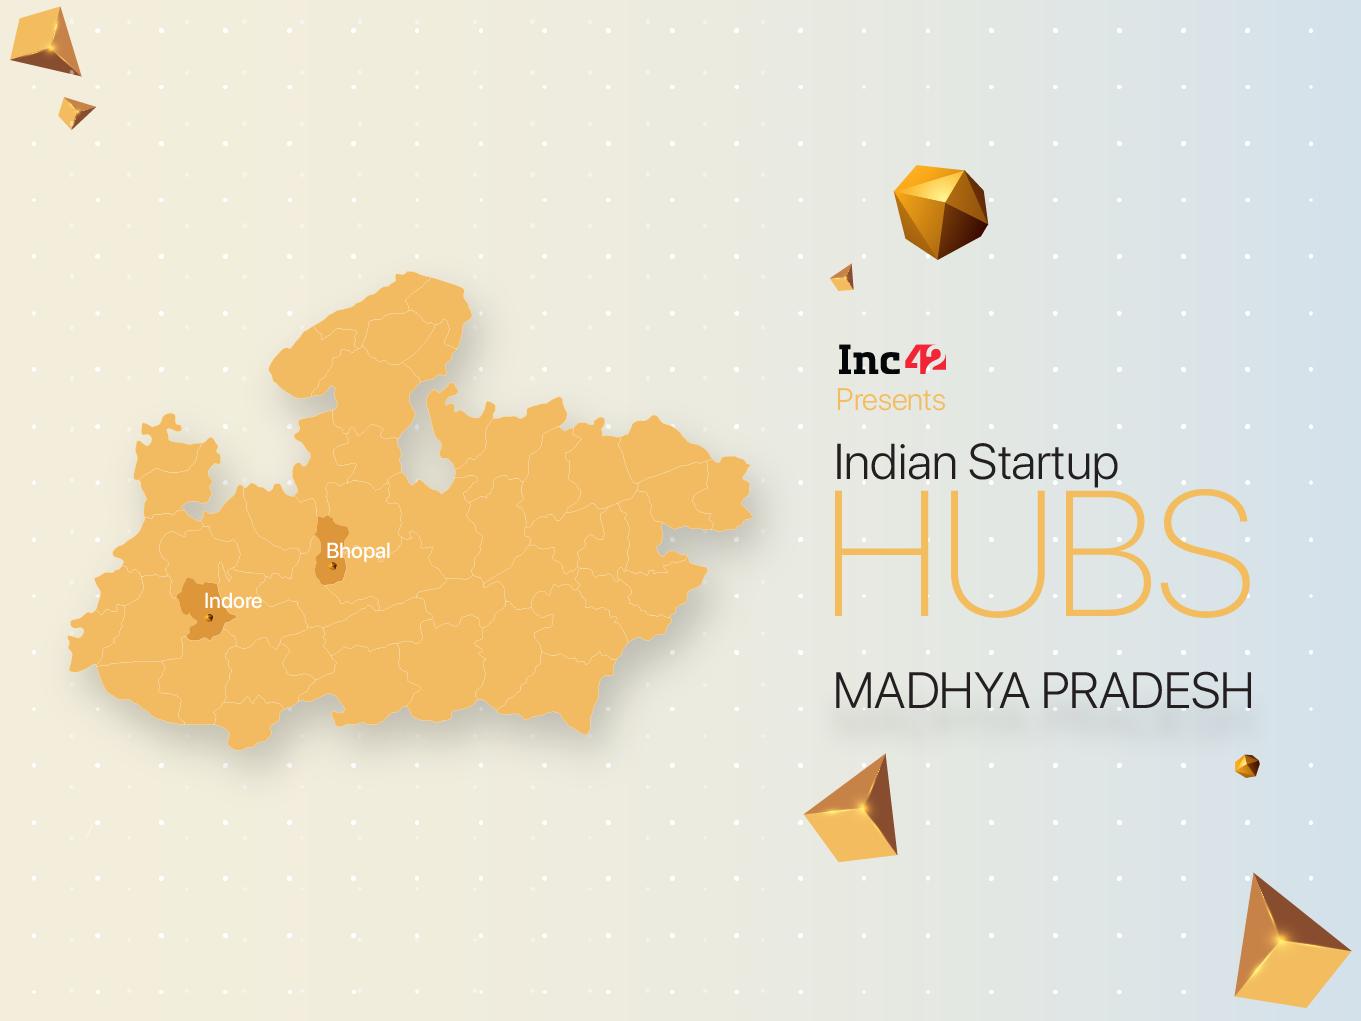 Madhya Pradesh Startups Grow Hard Way Amid Funding, Mentor Crunch